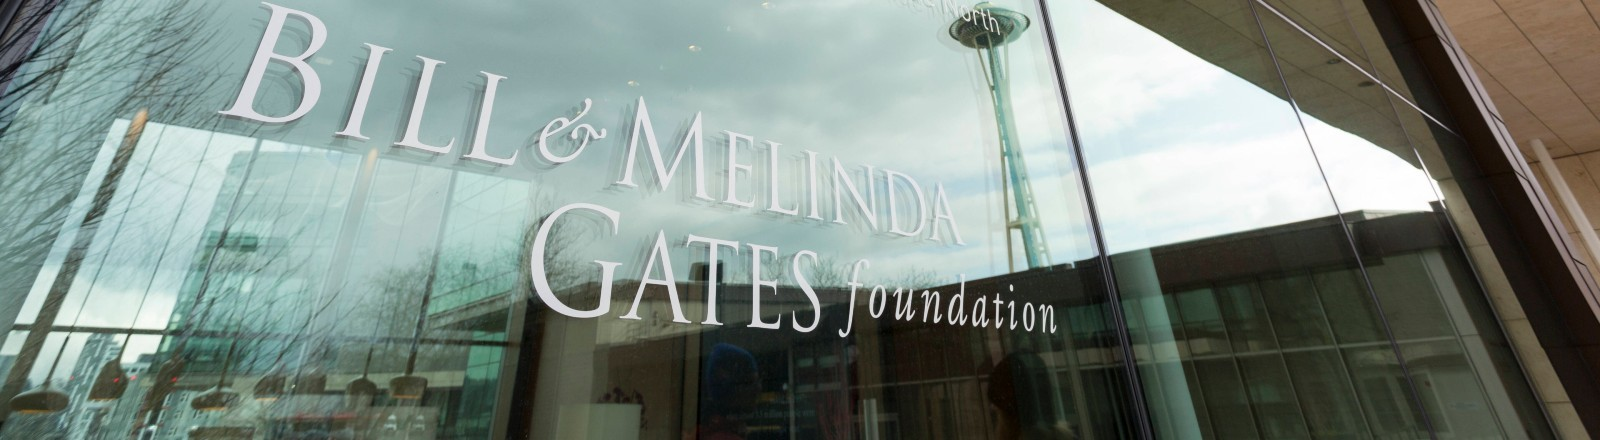 Eingang der Bill and Melinda Gates Foundation